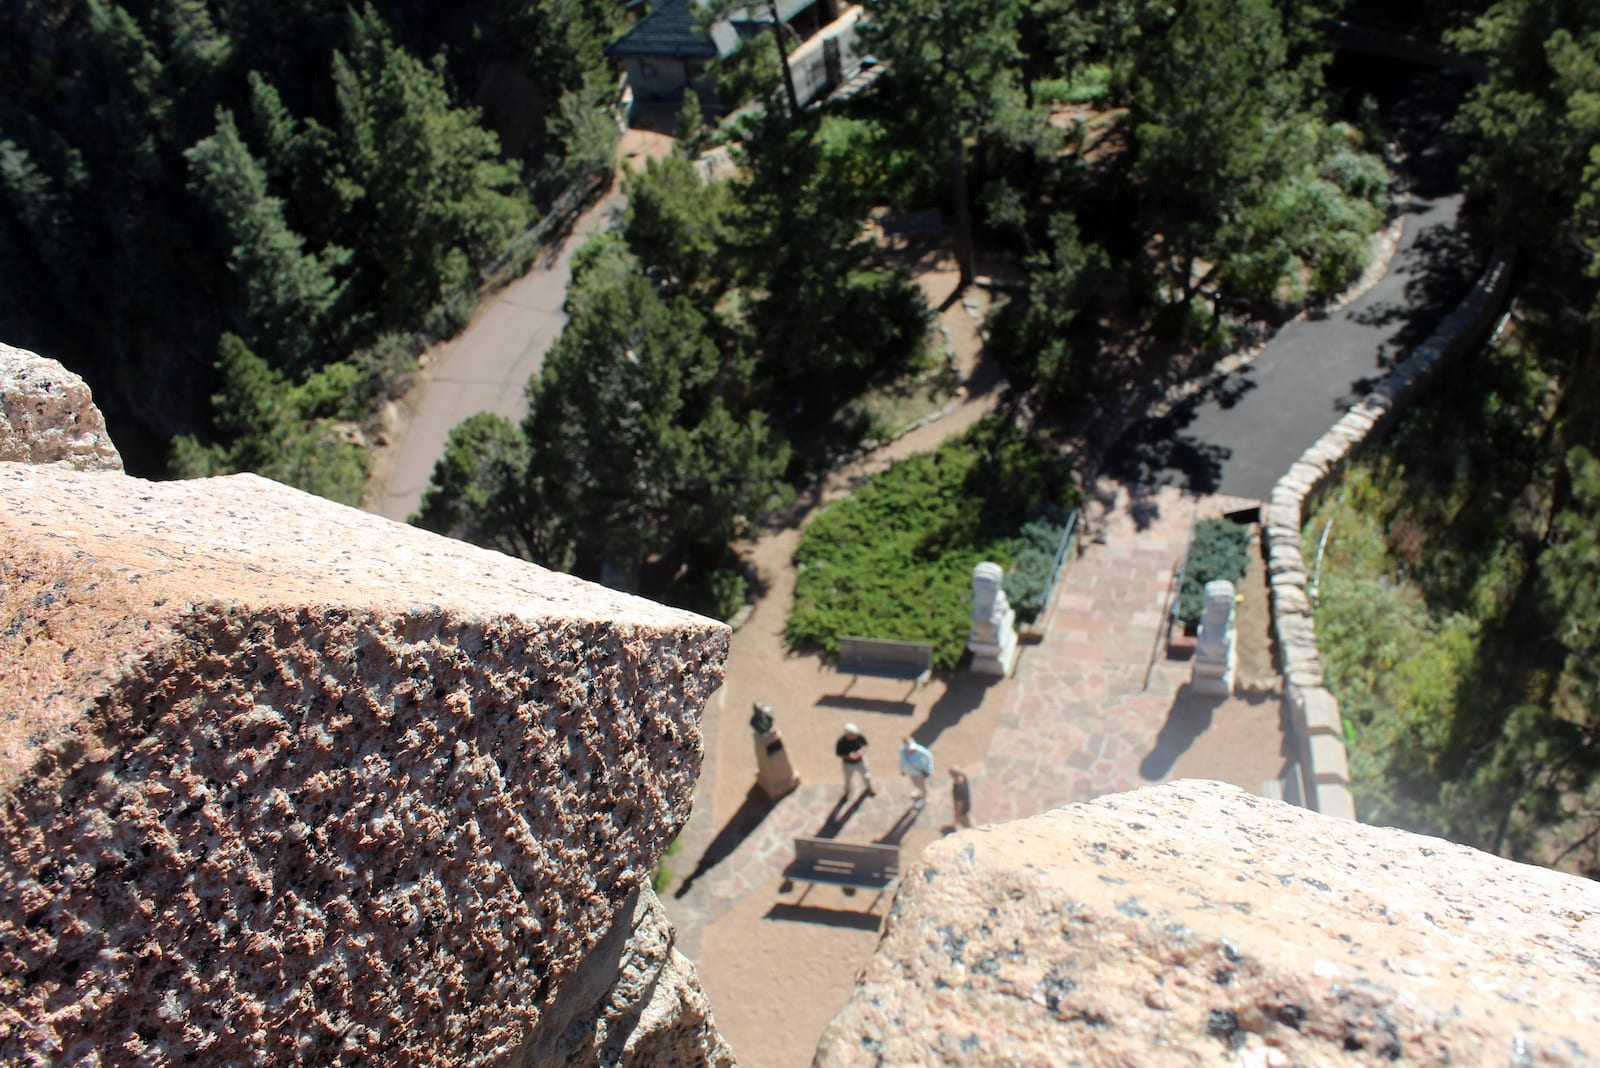 Will Rogers Shrine of the Sun Colorado Springs Will Rogers Shrine of the Sun Aerial Overlook